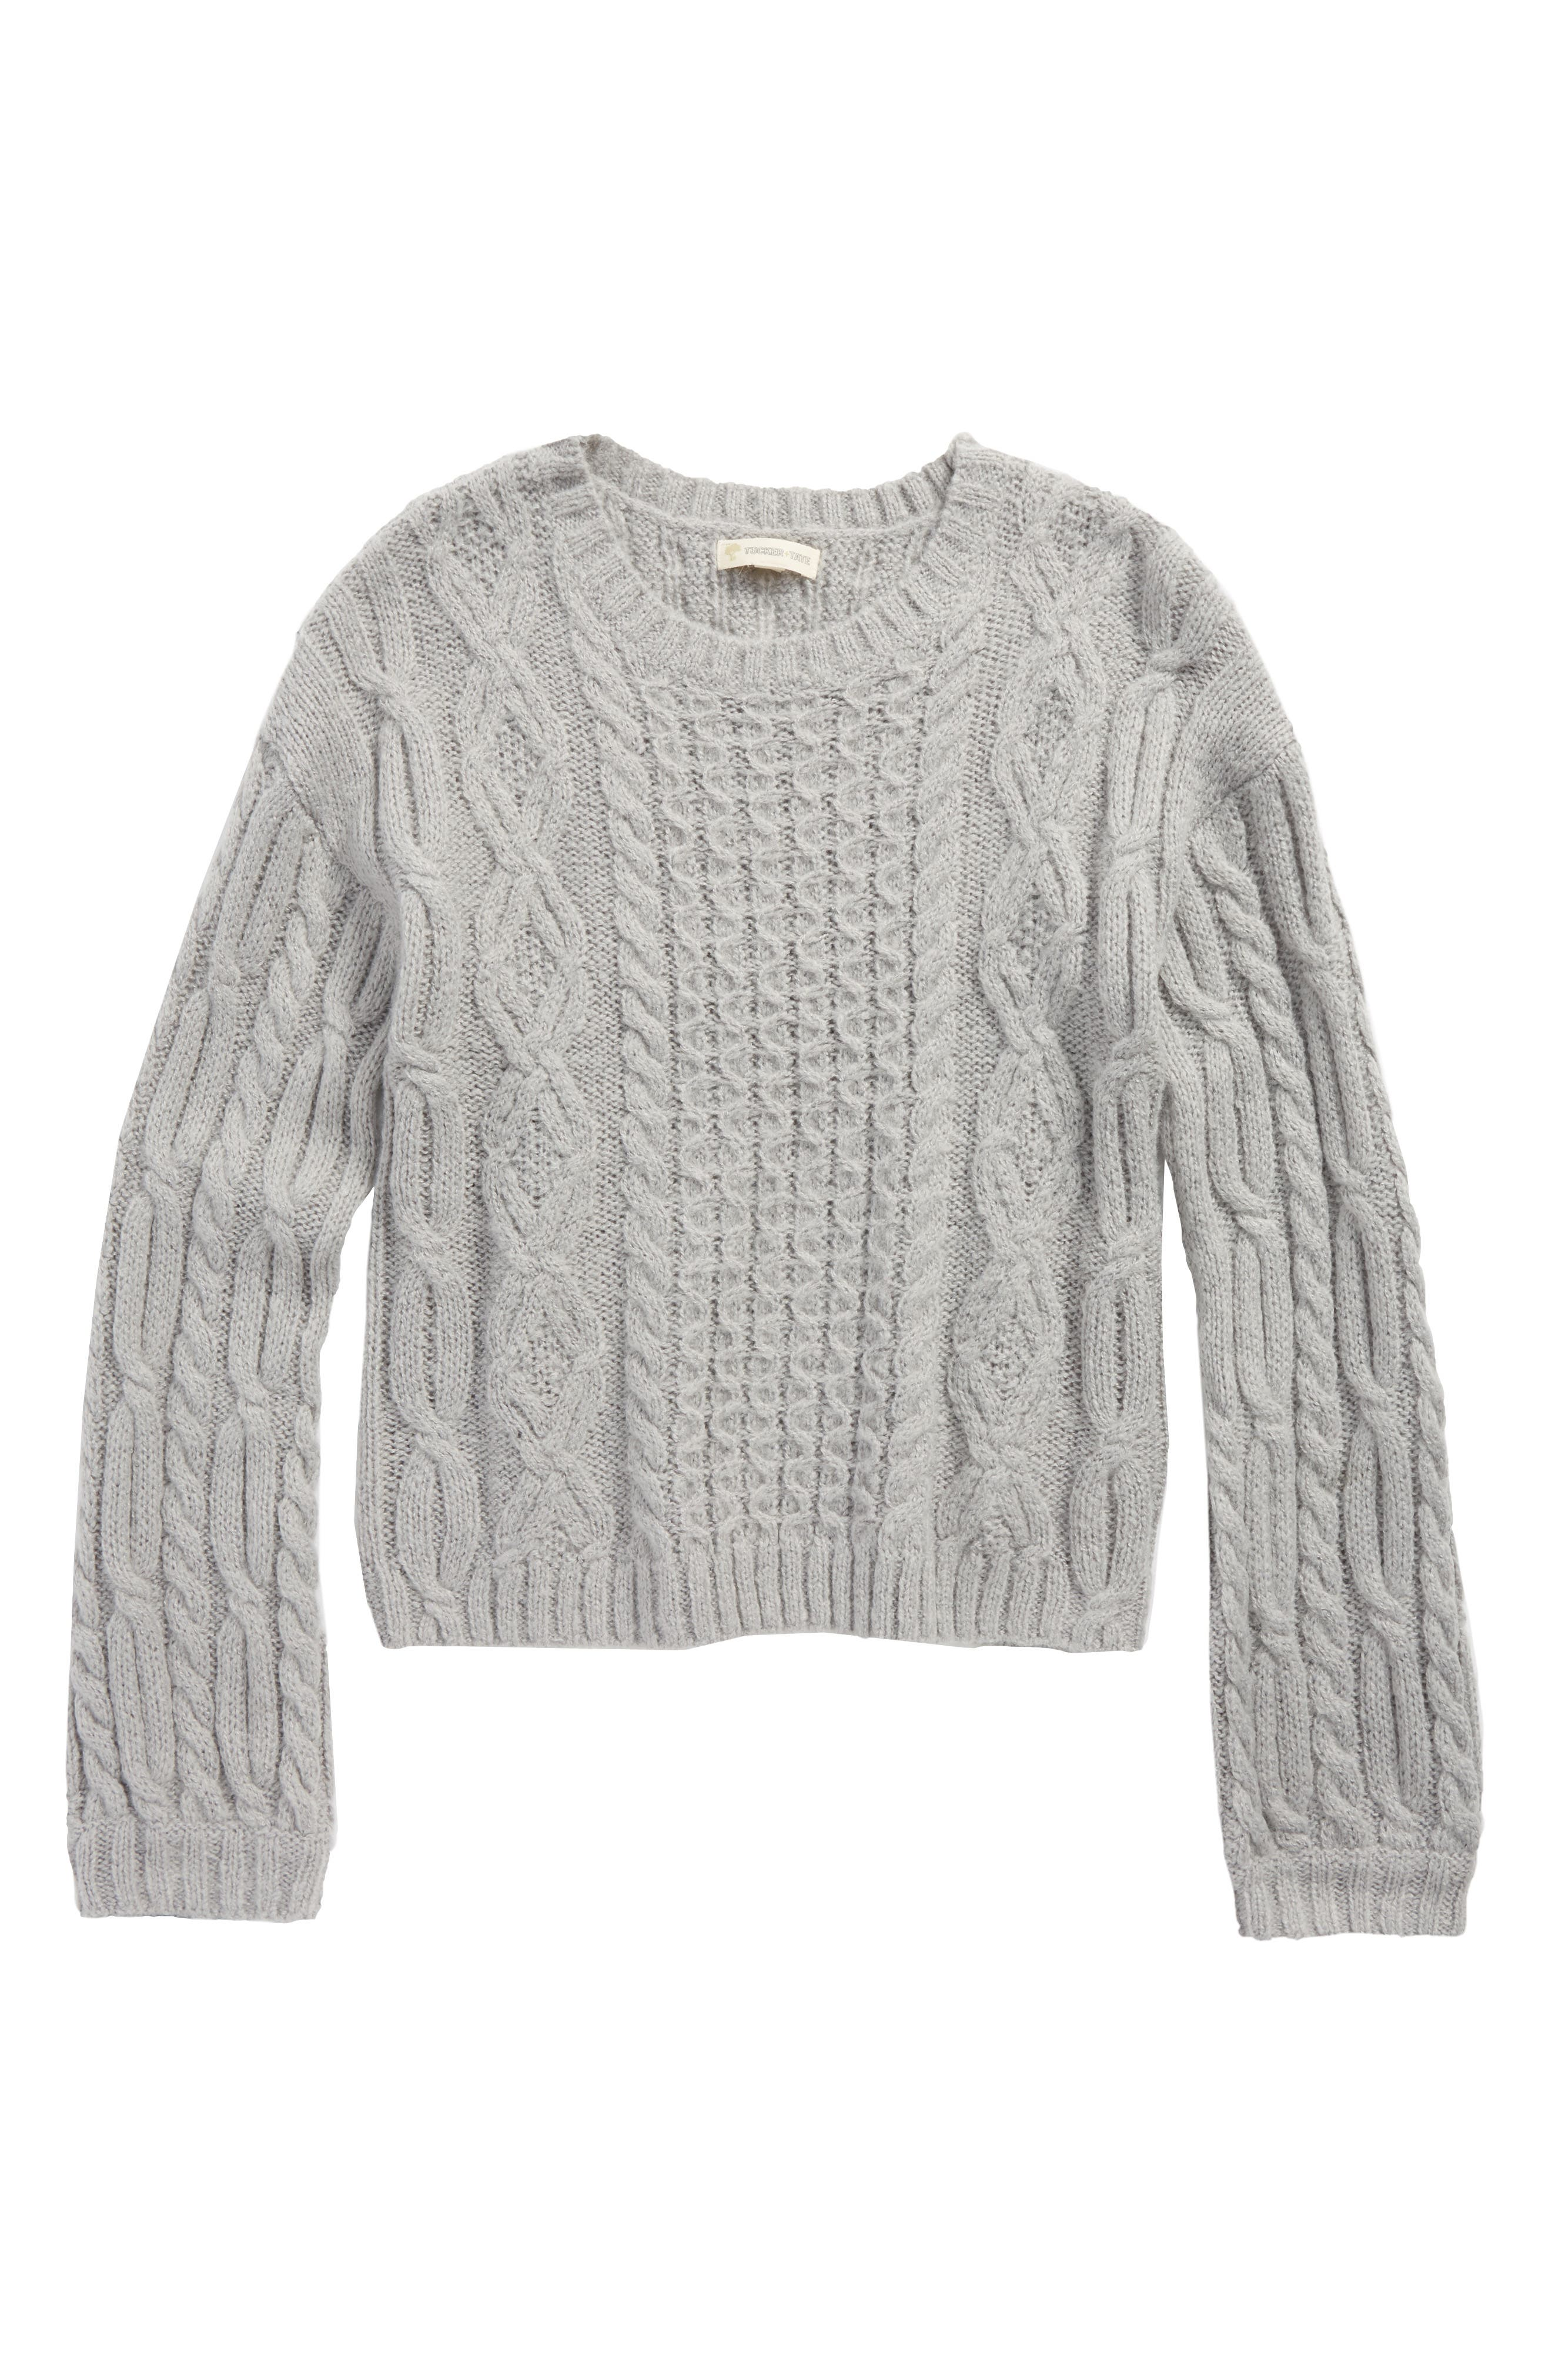 Main Image - Tucker + Tate Cable Sweater (Big Girls)